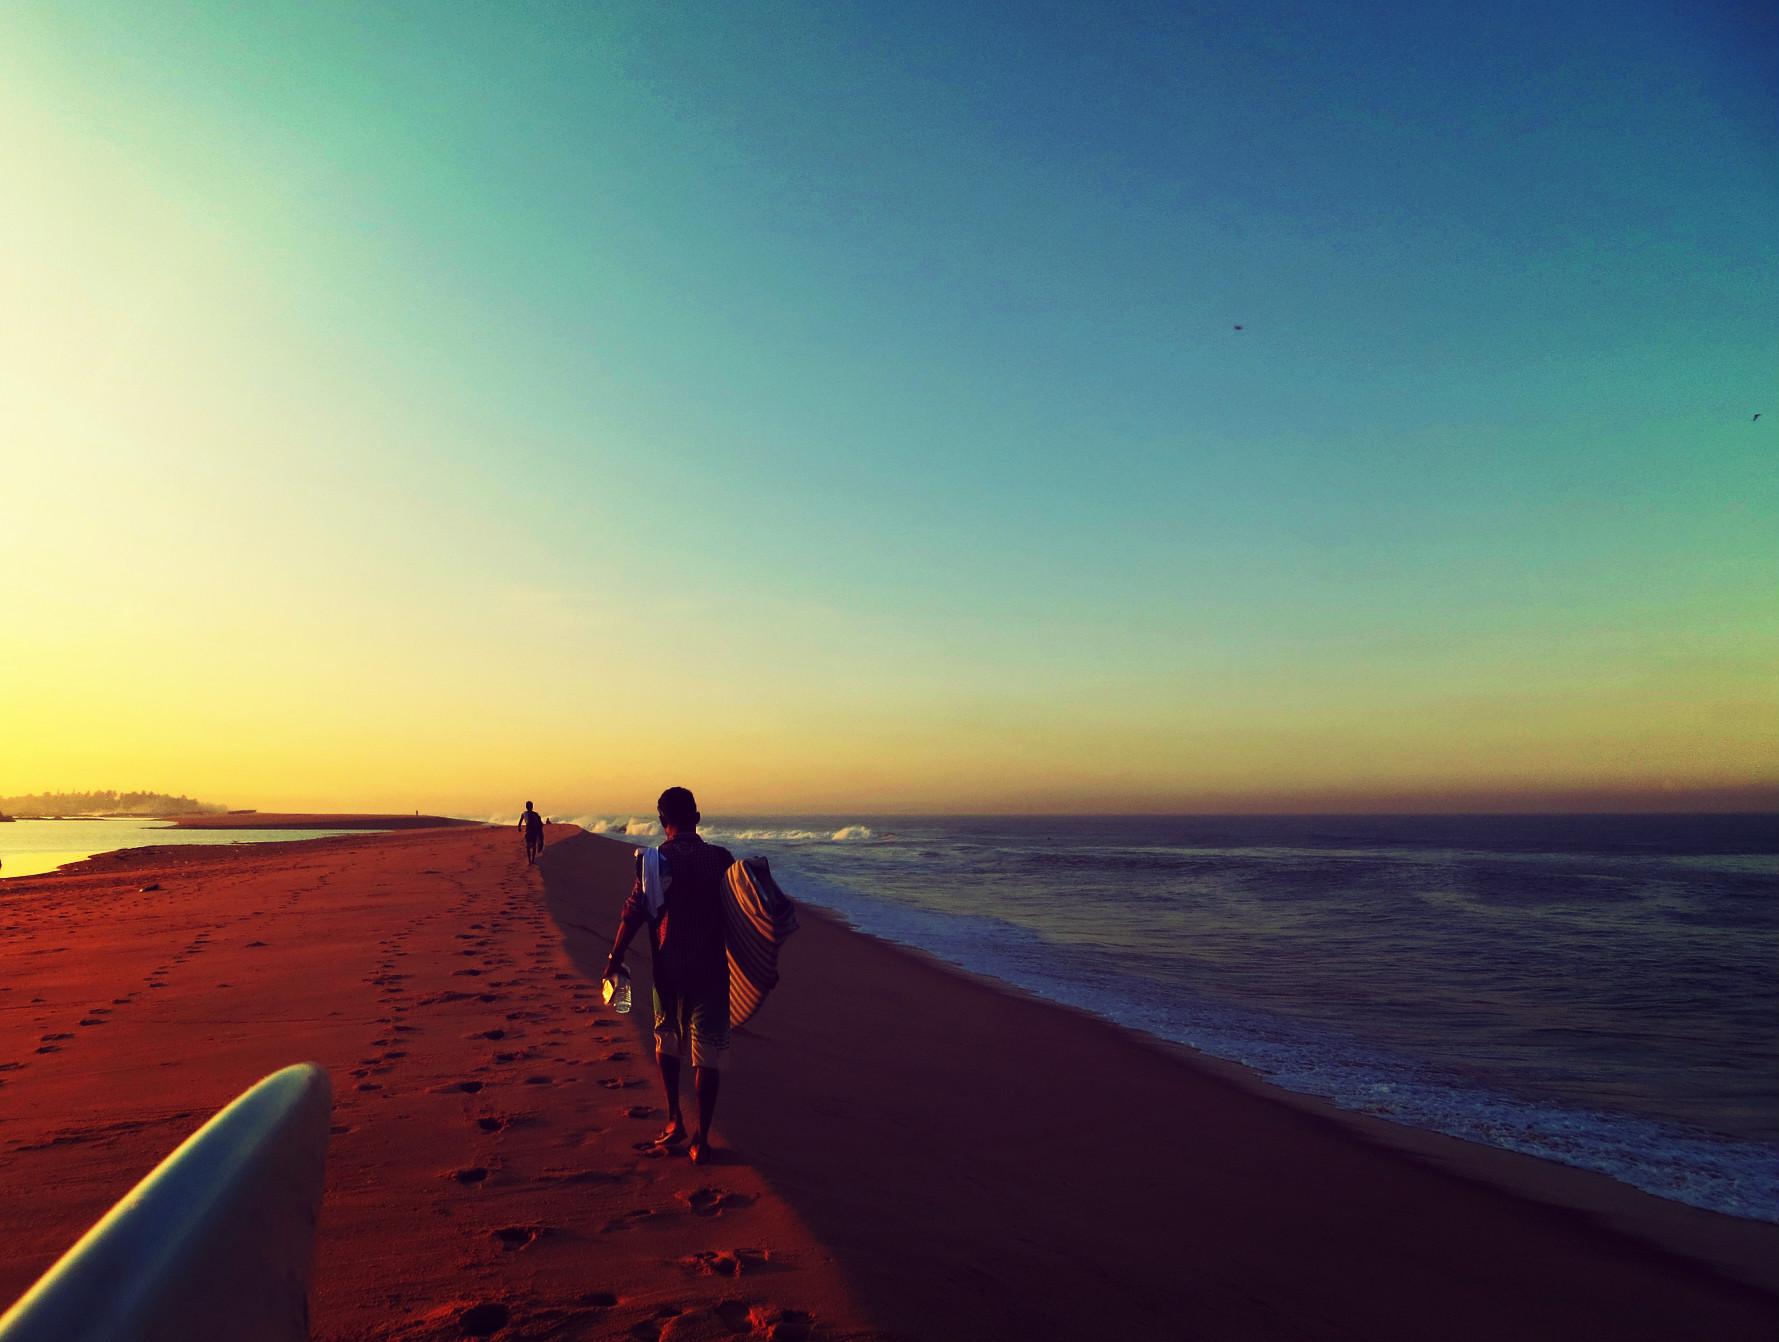 surfbeach1.jpg